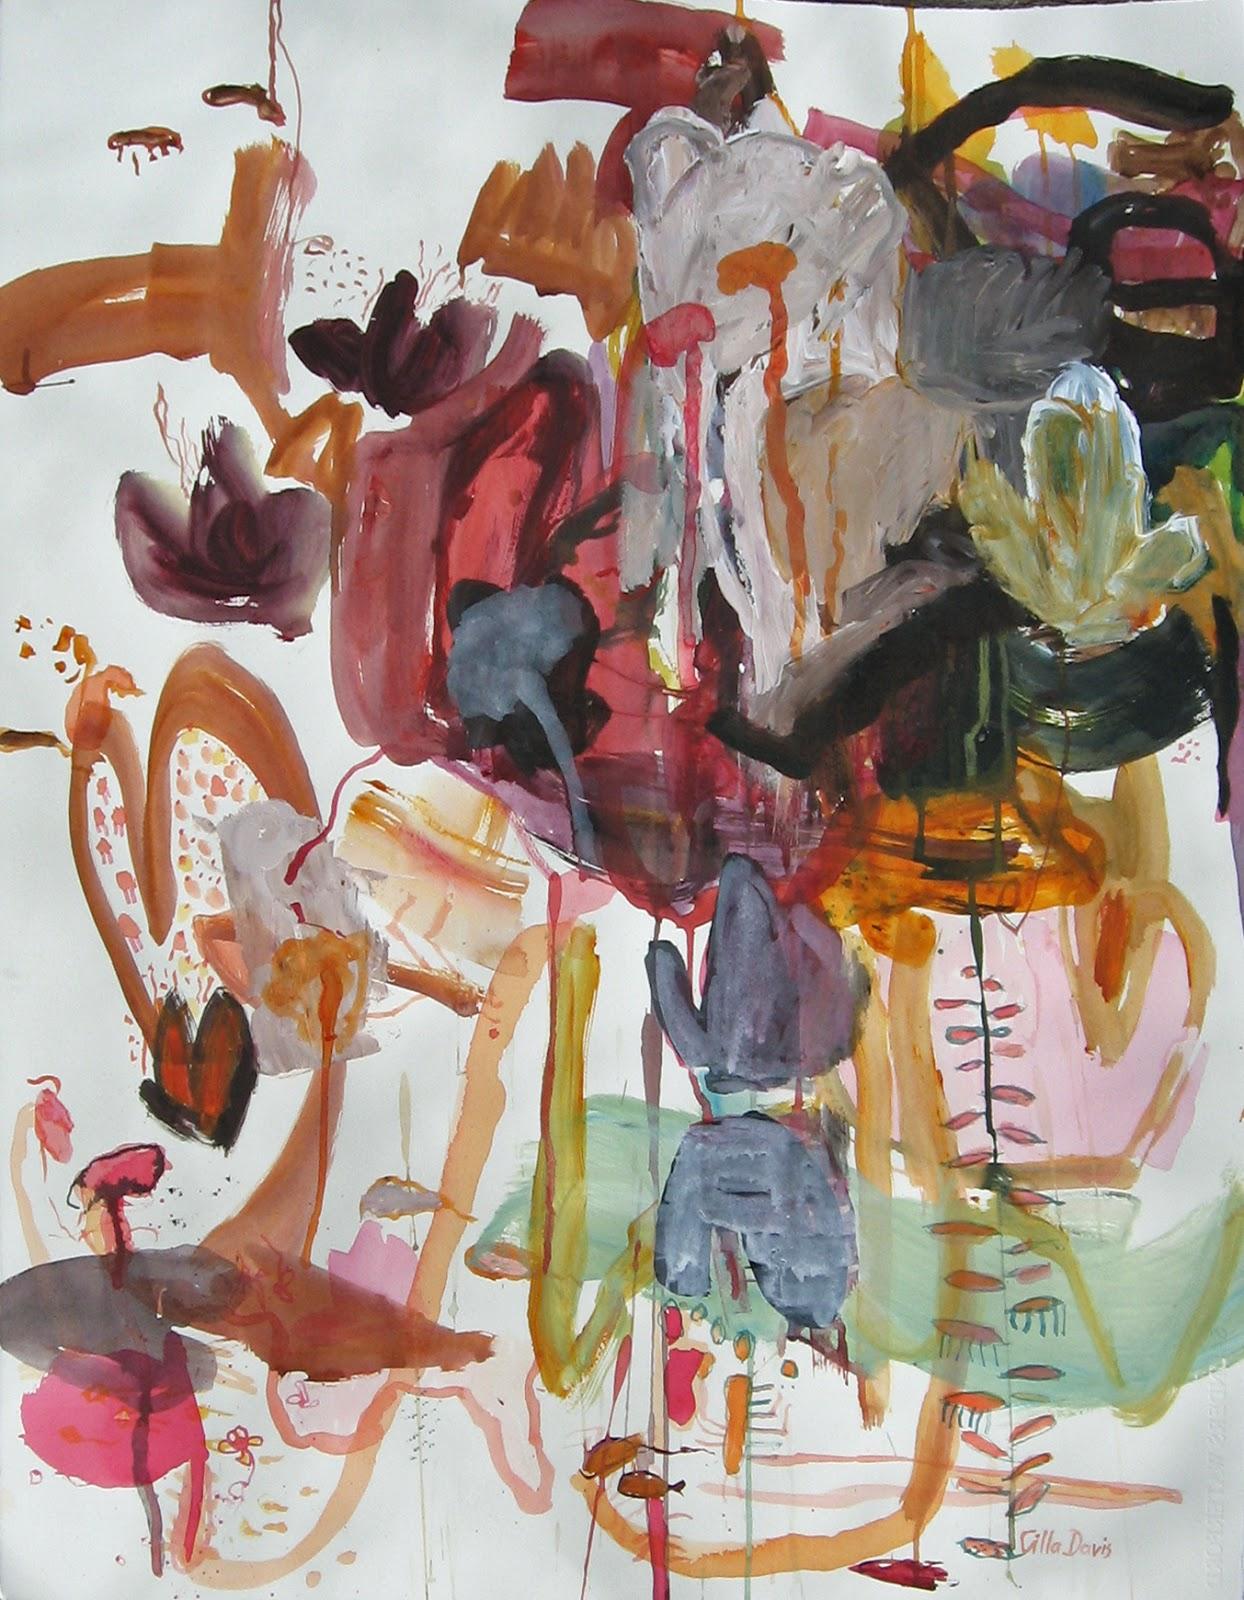 2013 LLOYD REES WINNER 'Pink Pond 2' by Cilla Davis